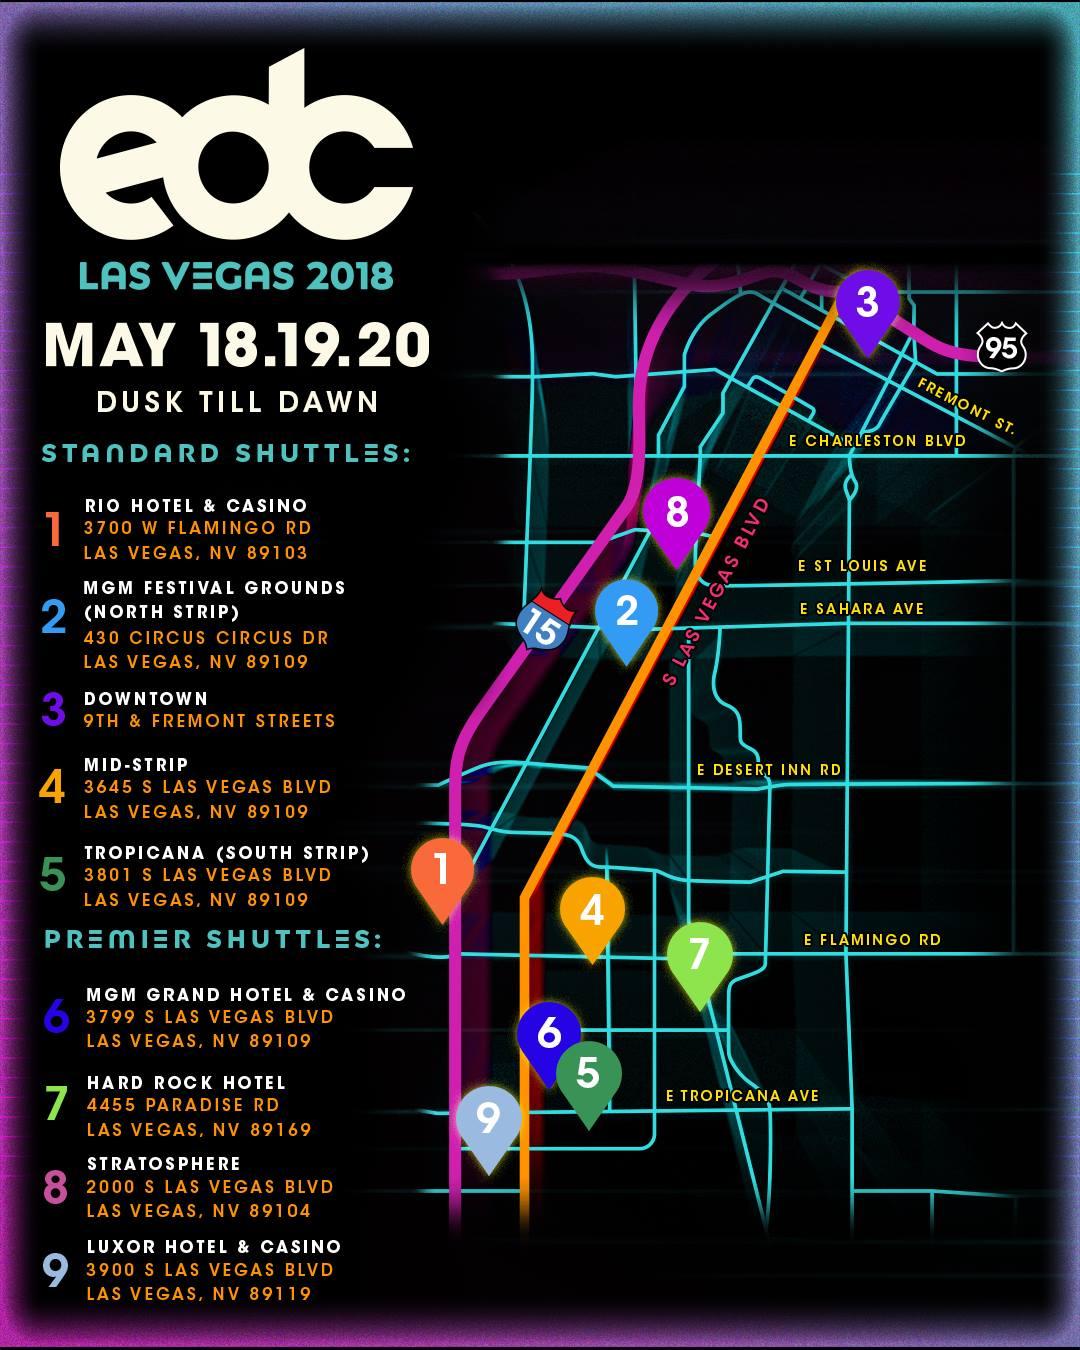 EDC Las Vegas 2018 Shuttle Routes NEW